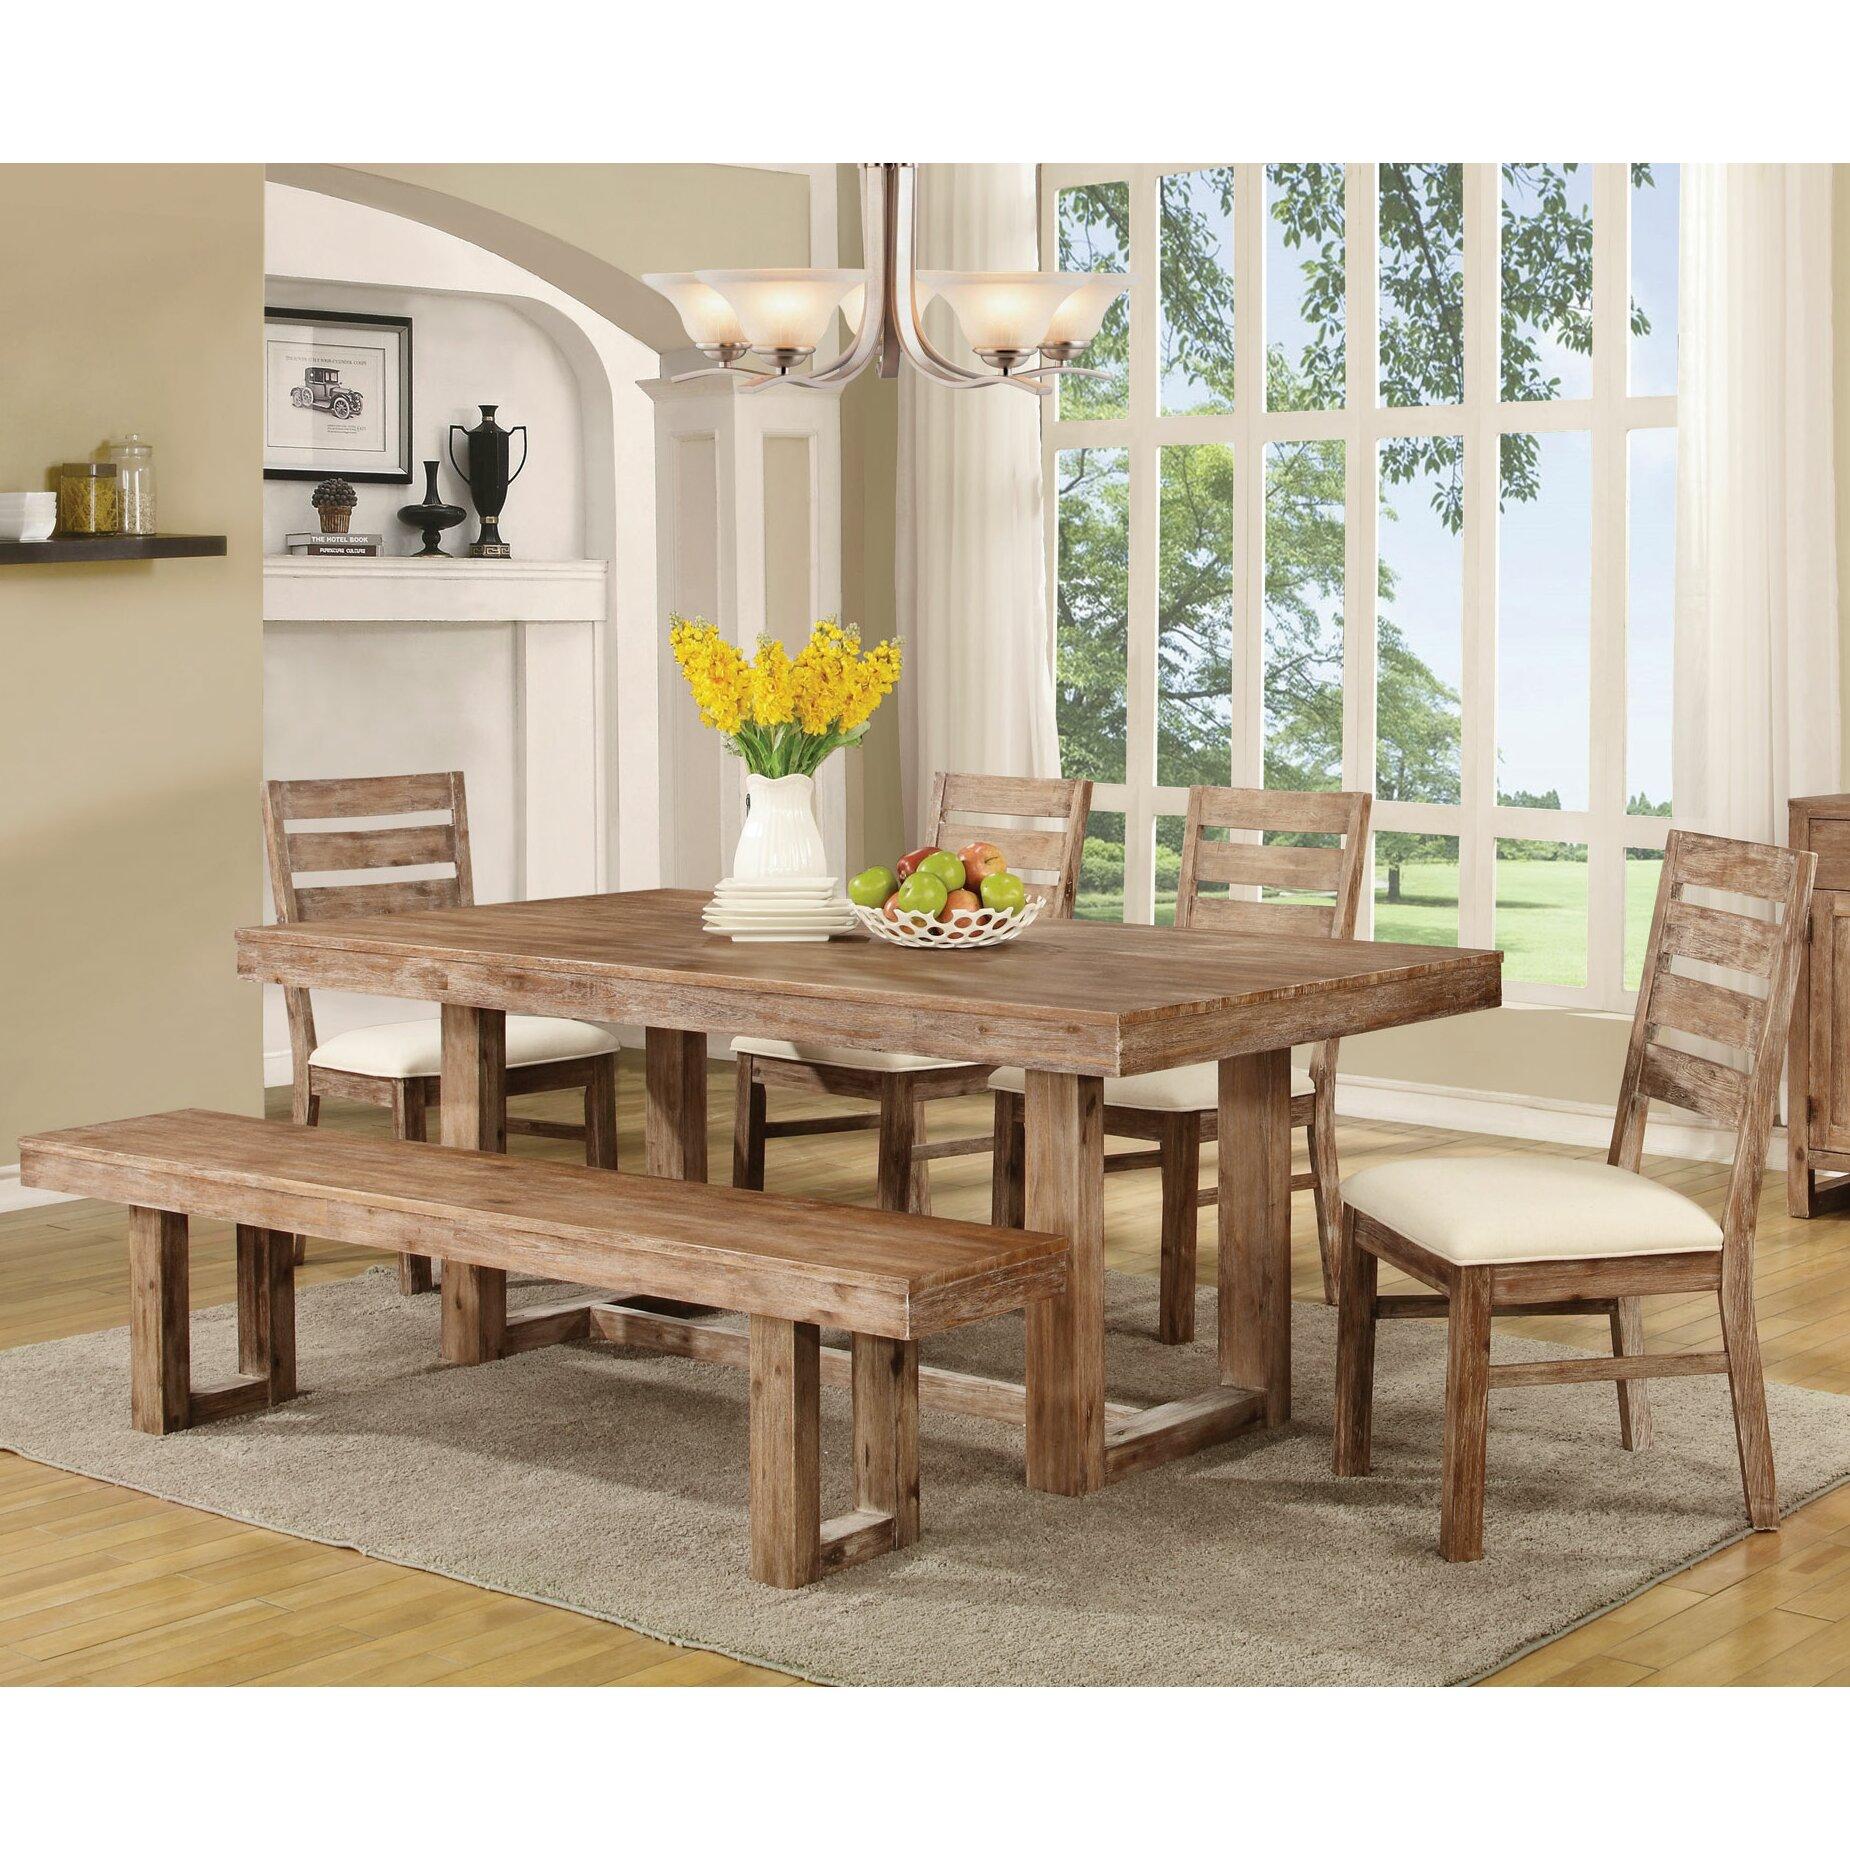 Farmhouse Dining Table: Laurel Foundry Modern Farmhouse Hector Dining Table